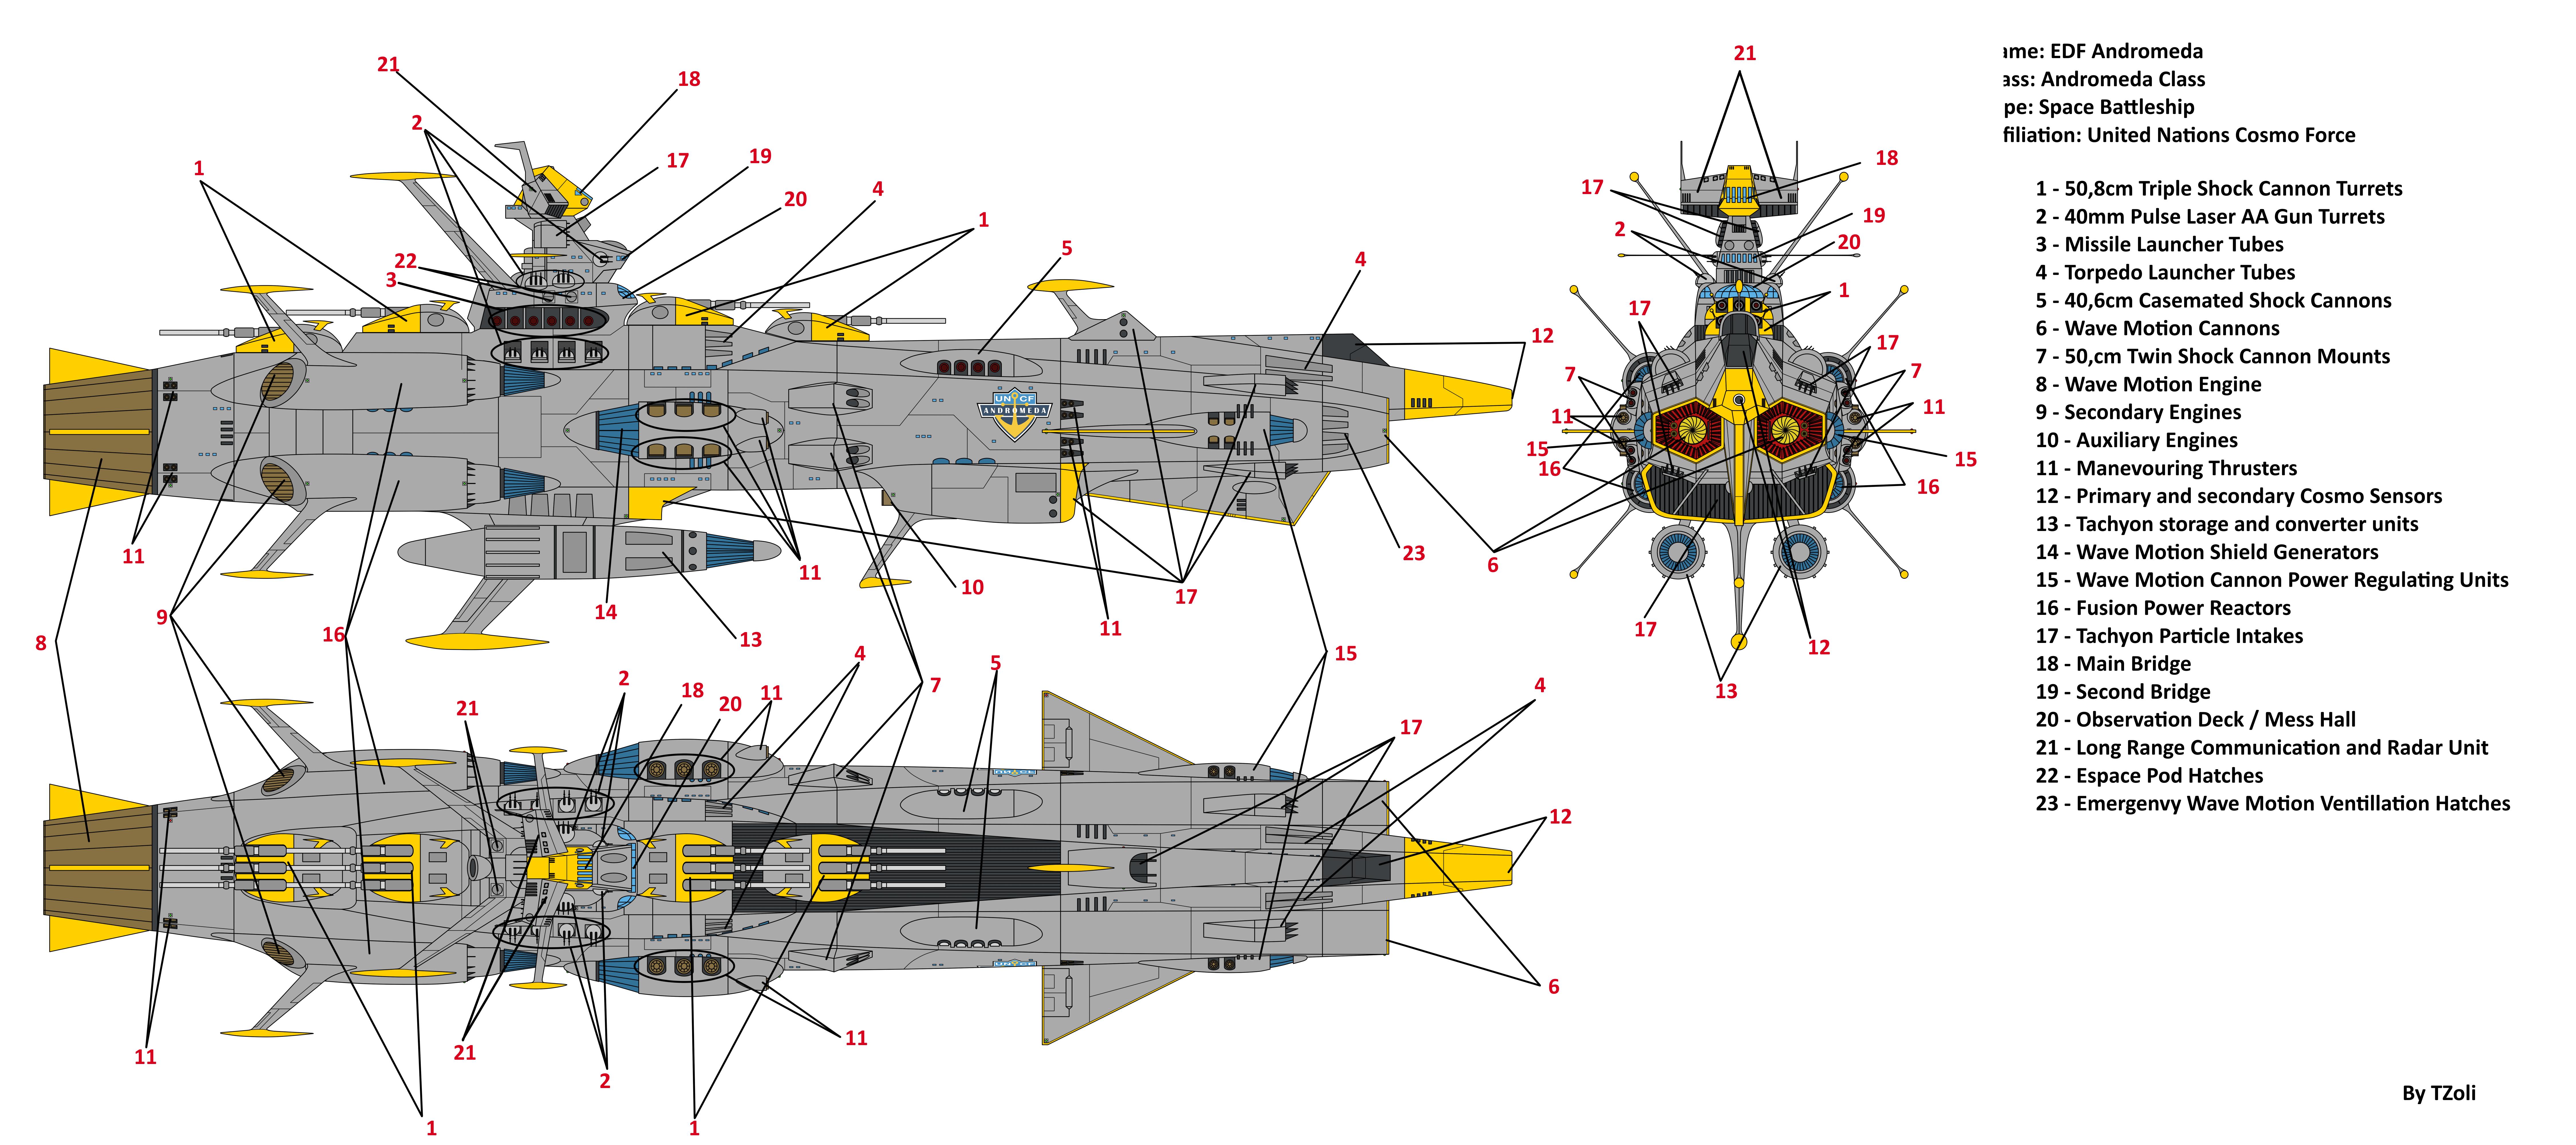 Edf Andromeda Diagram By Tzoli On Deviantart